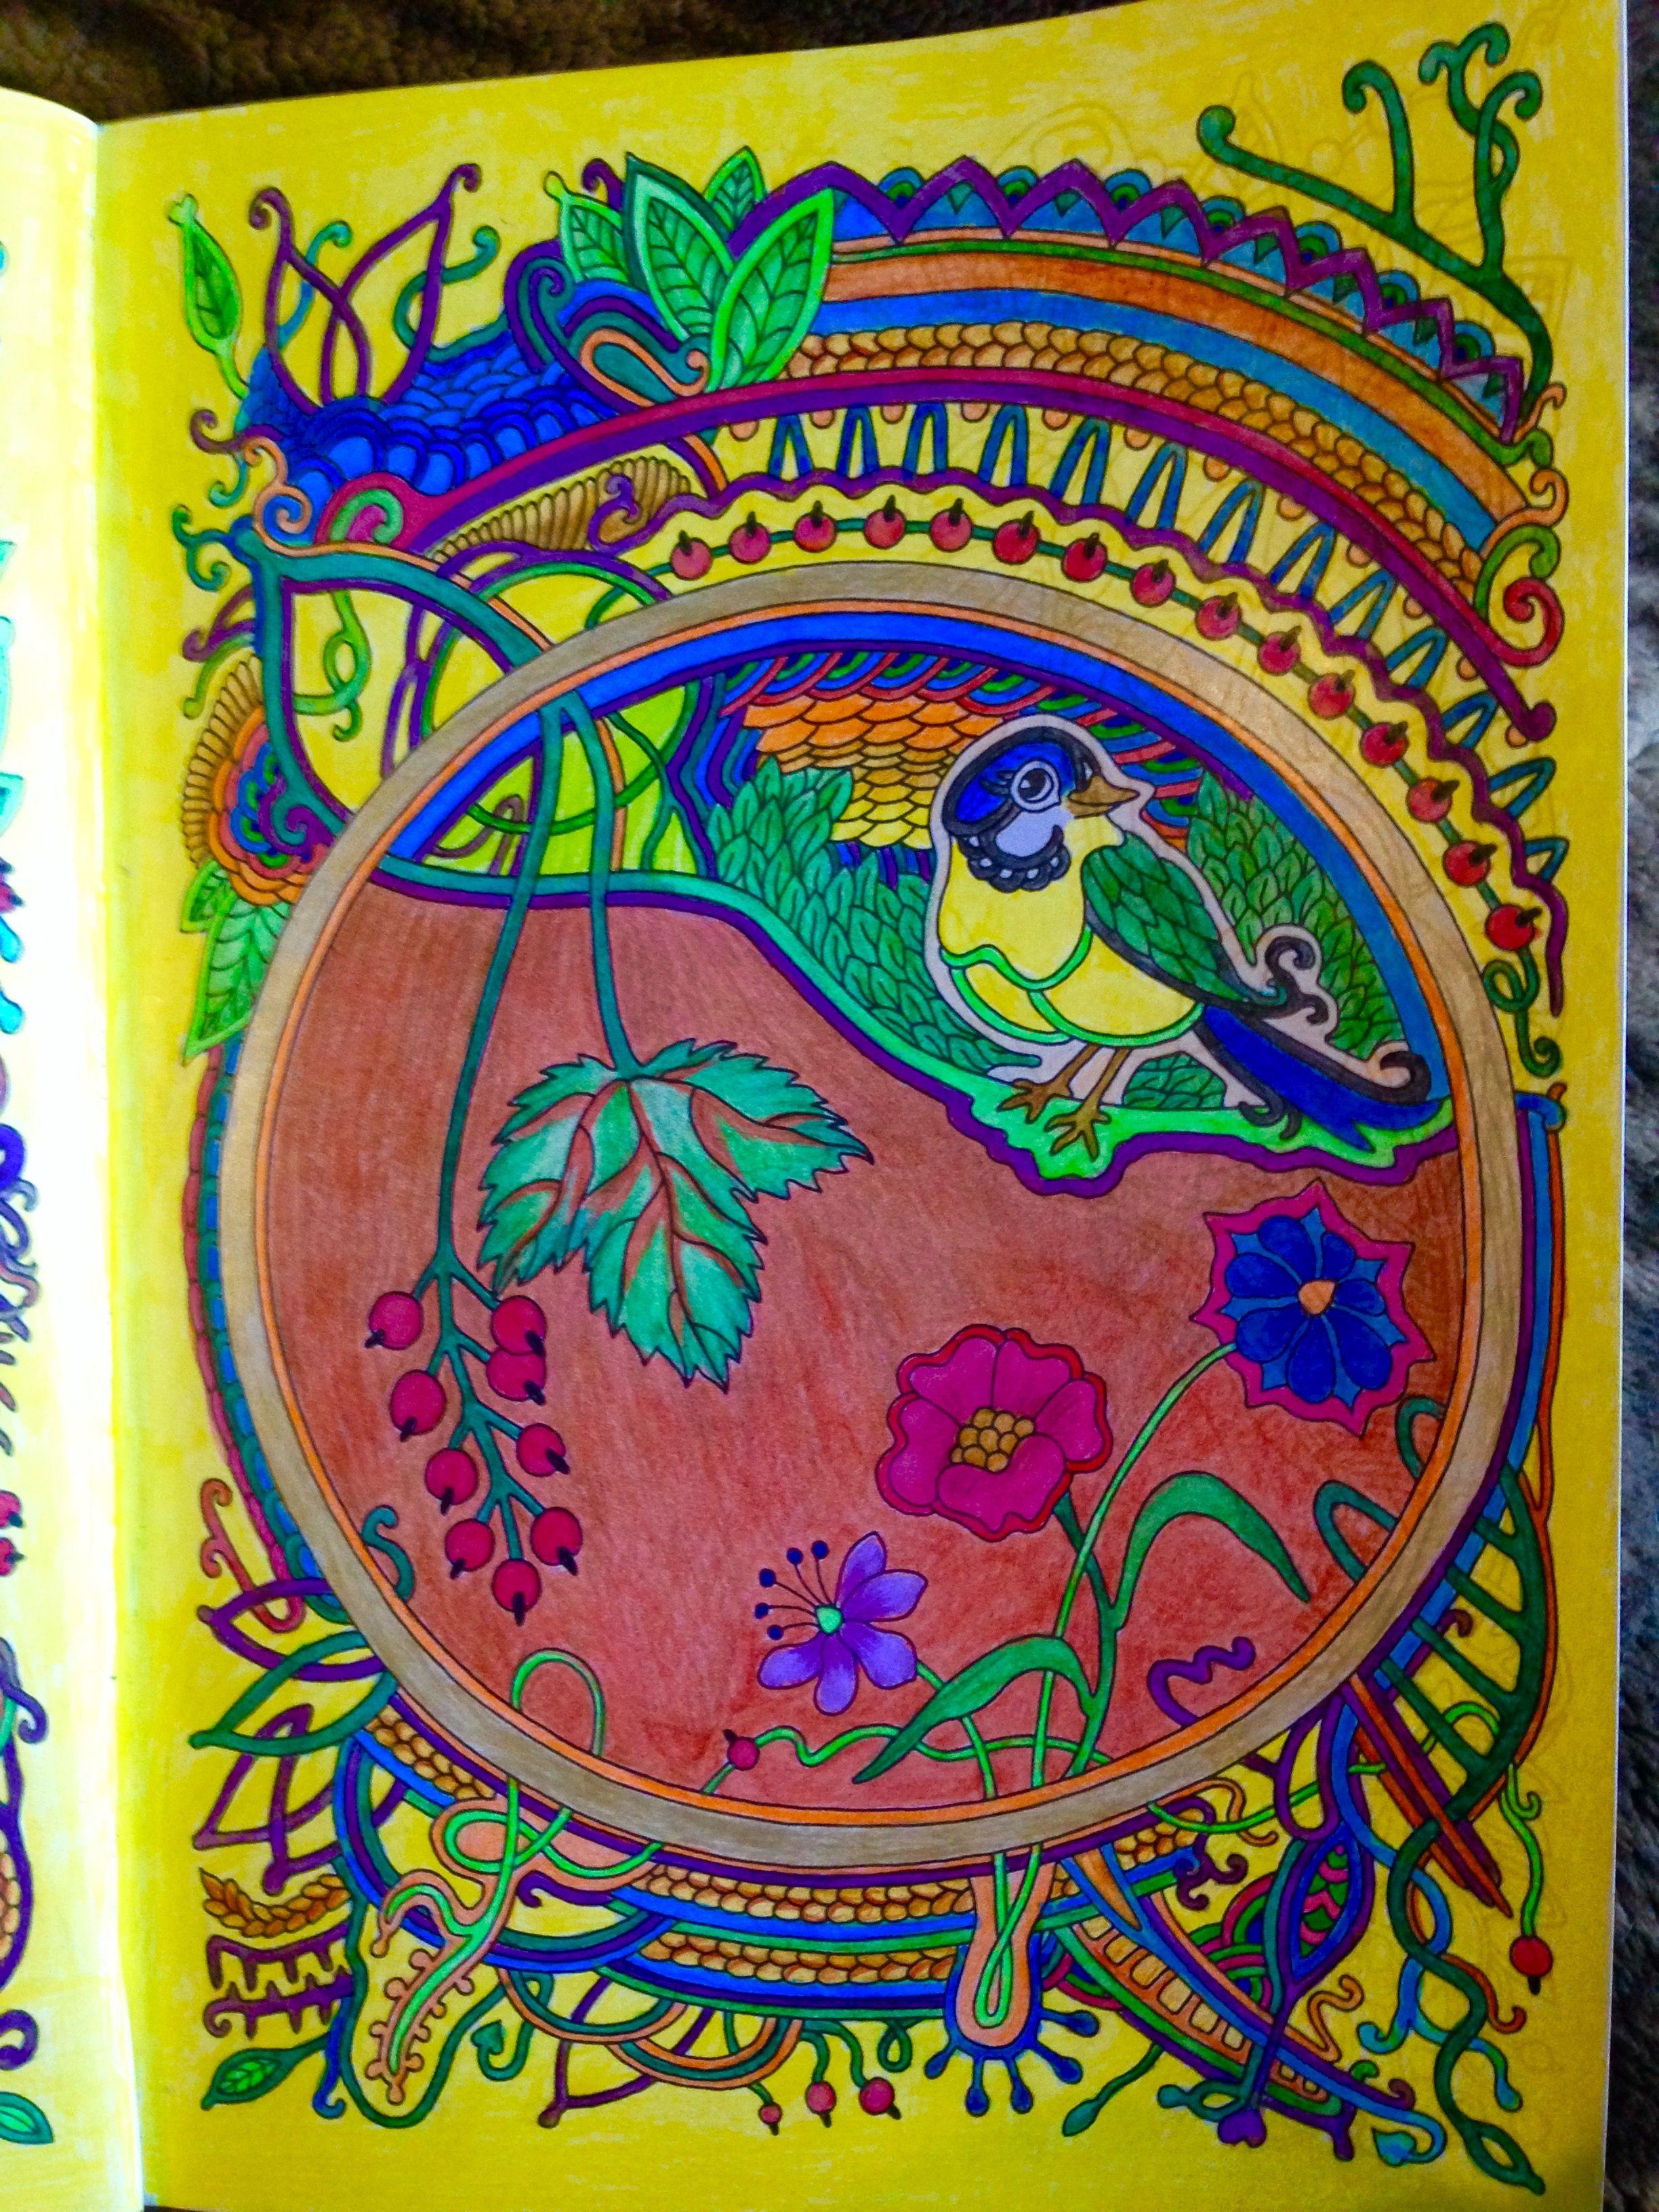 Ветер уносит цветы. Ольга Головешкина. | Coloring pages, Color